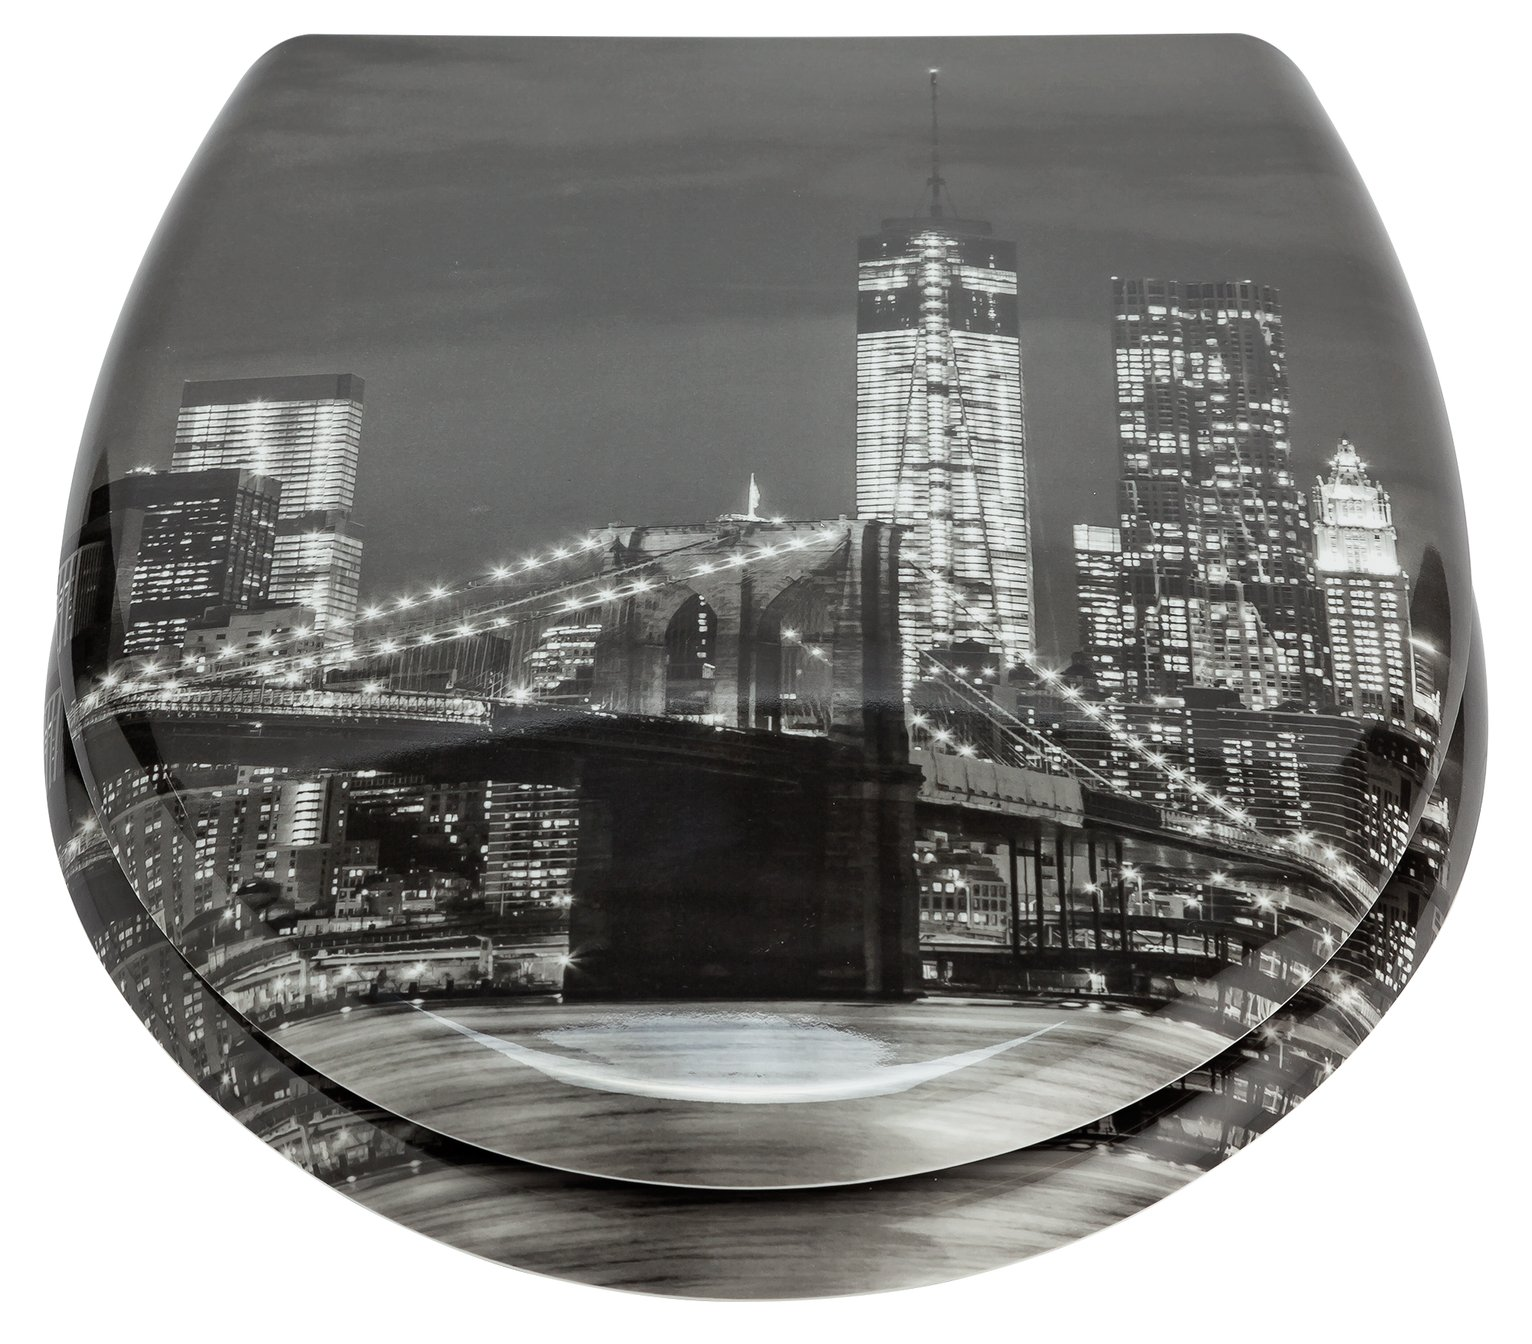 Argos Home New York City Skyline Toilet Seat